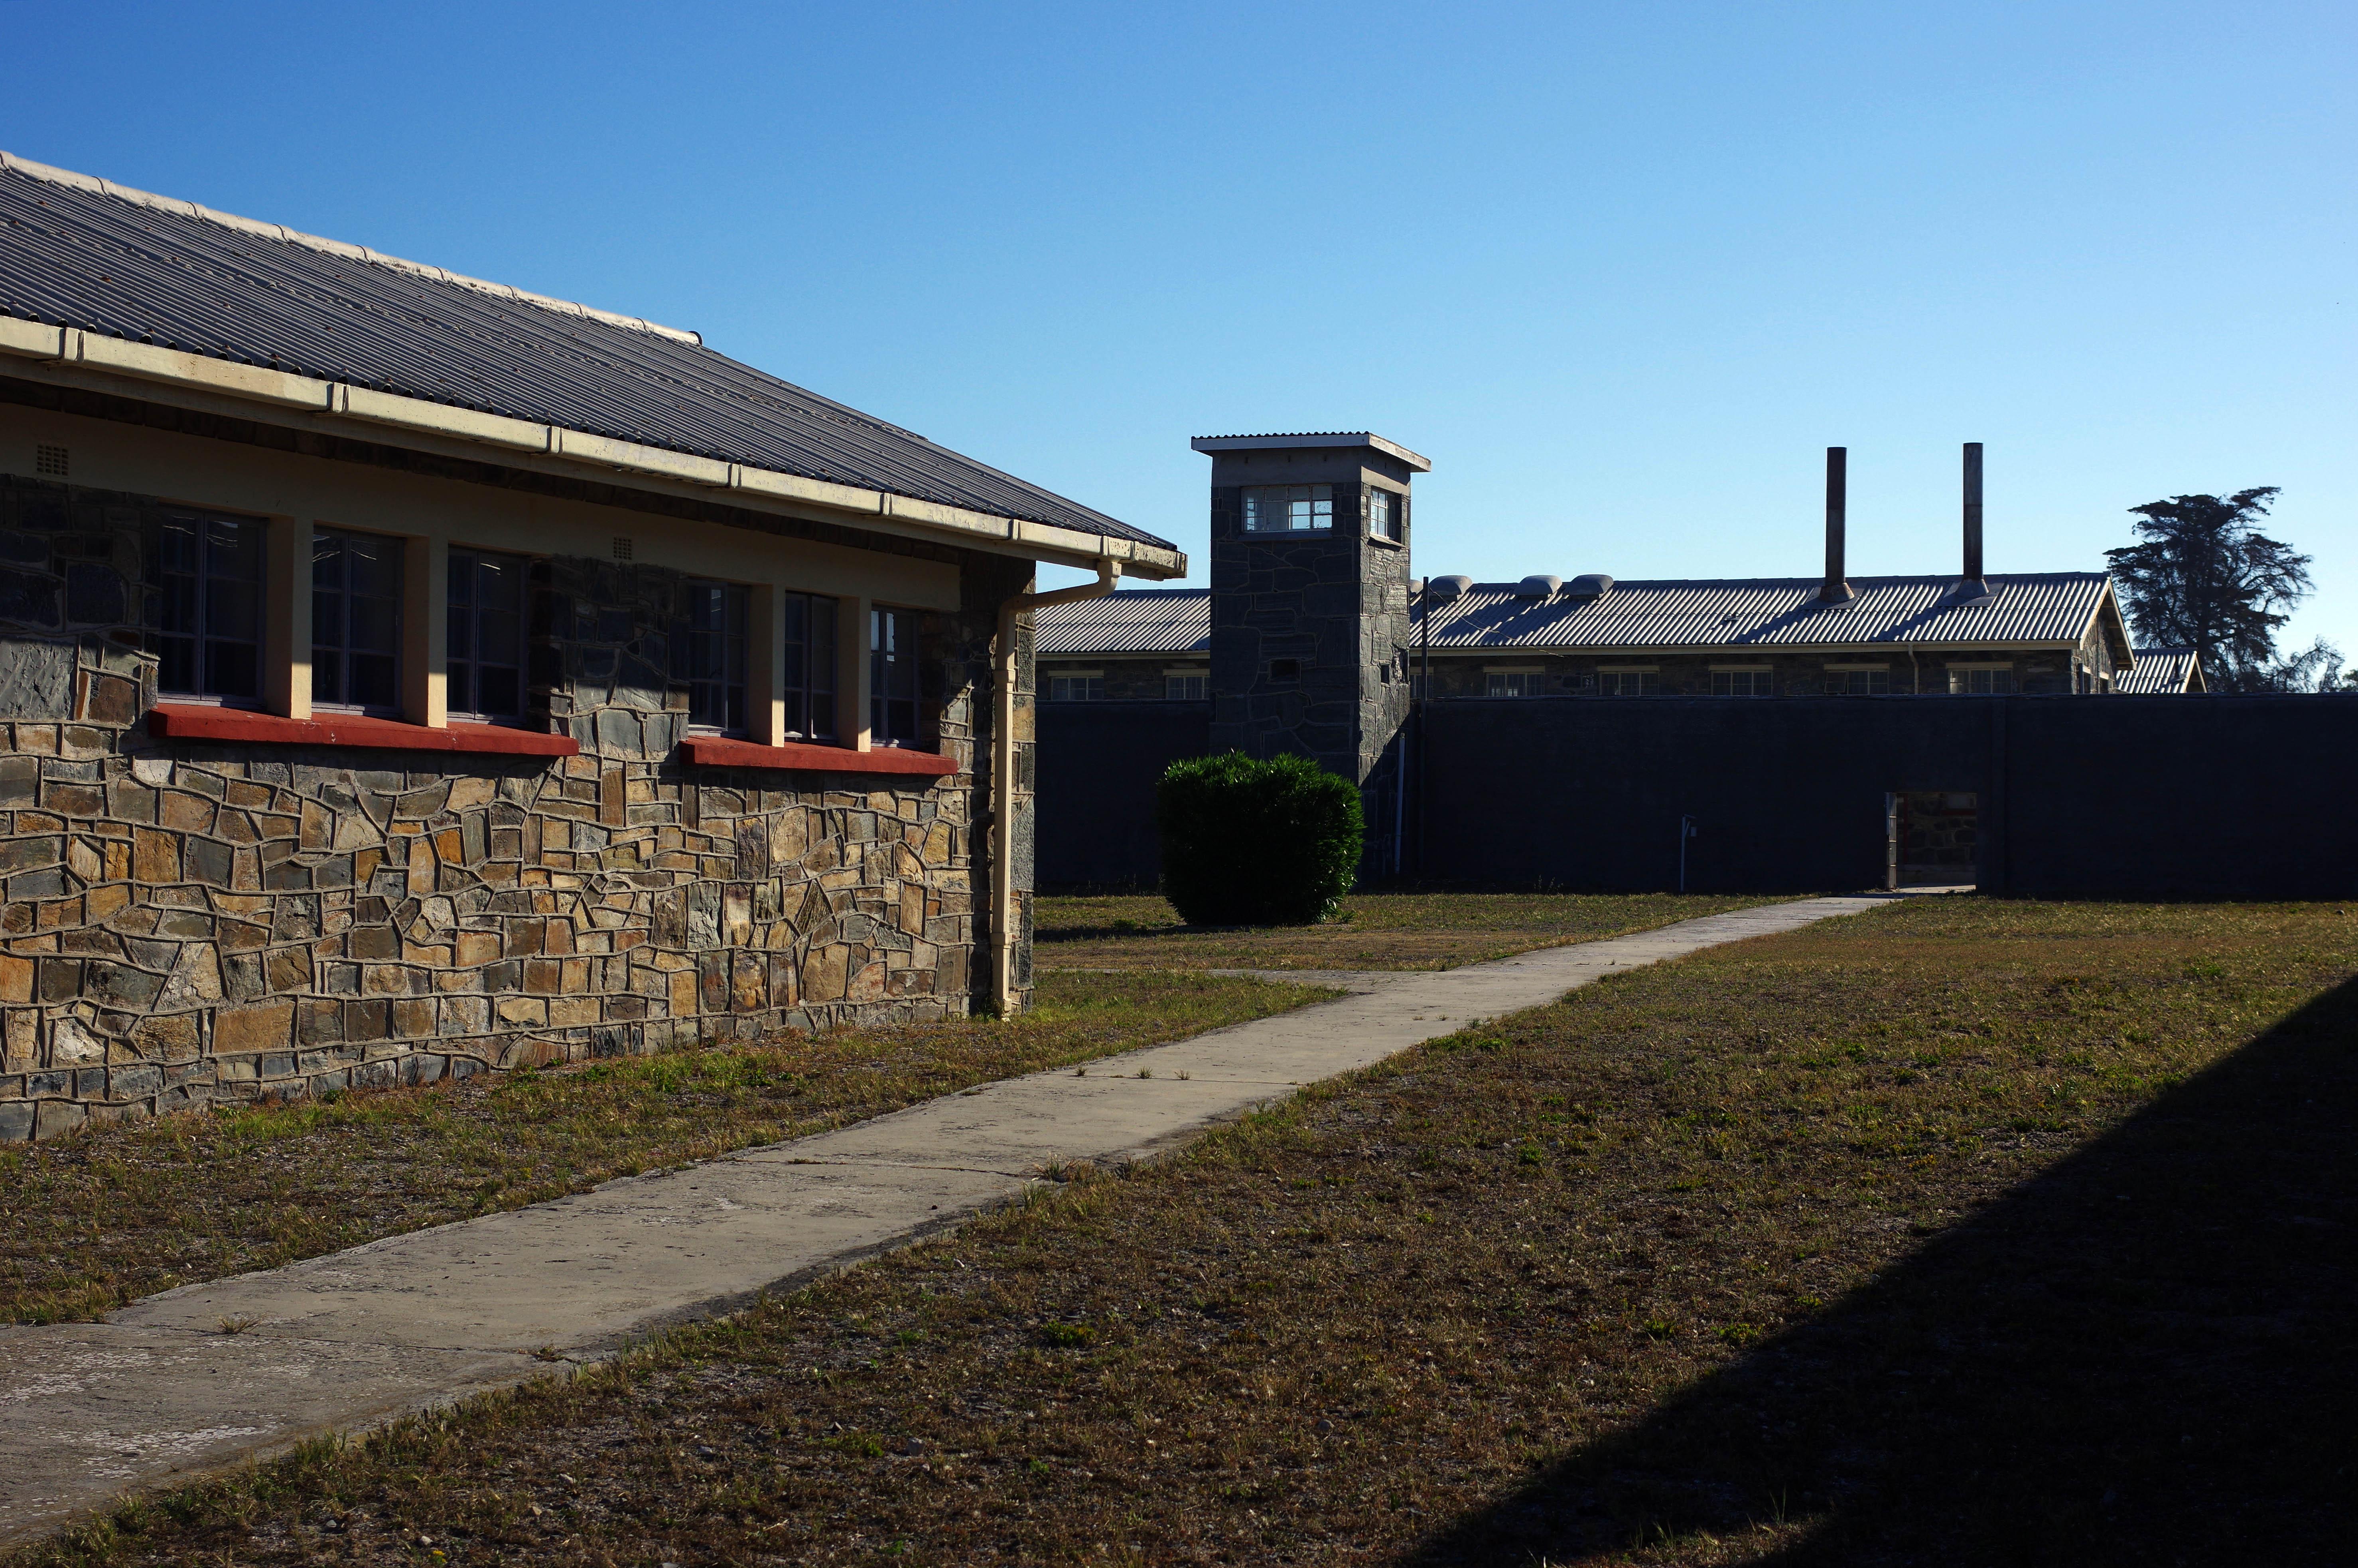 171122_CT_Robben island23